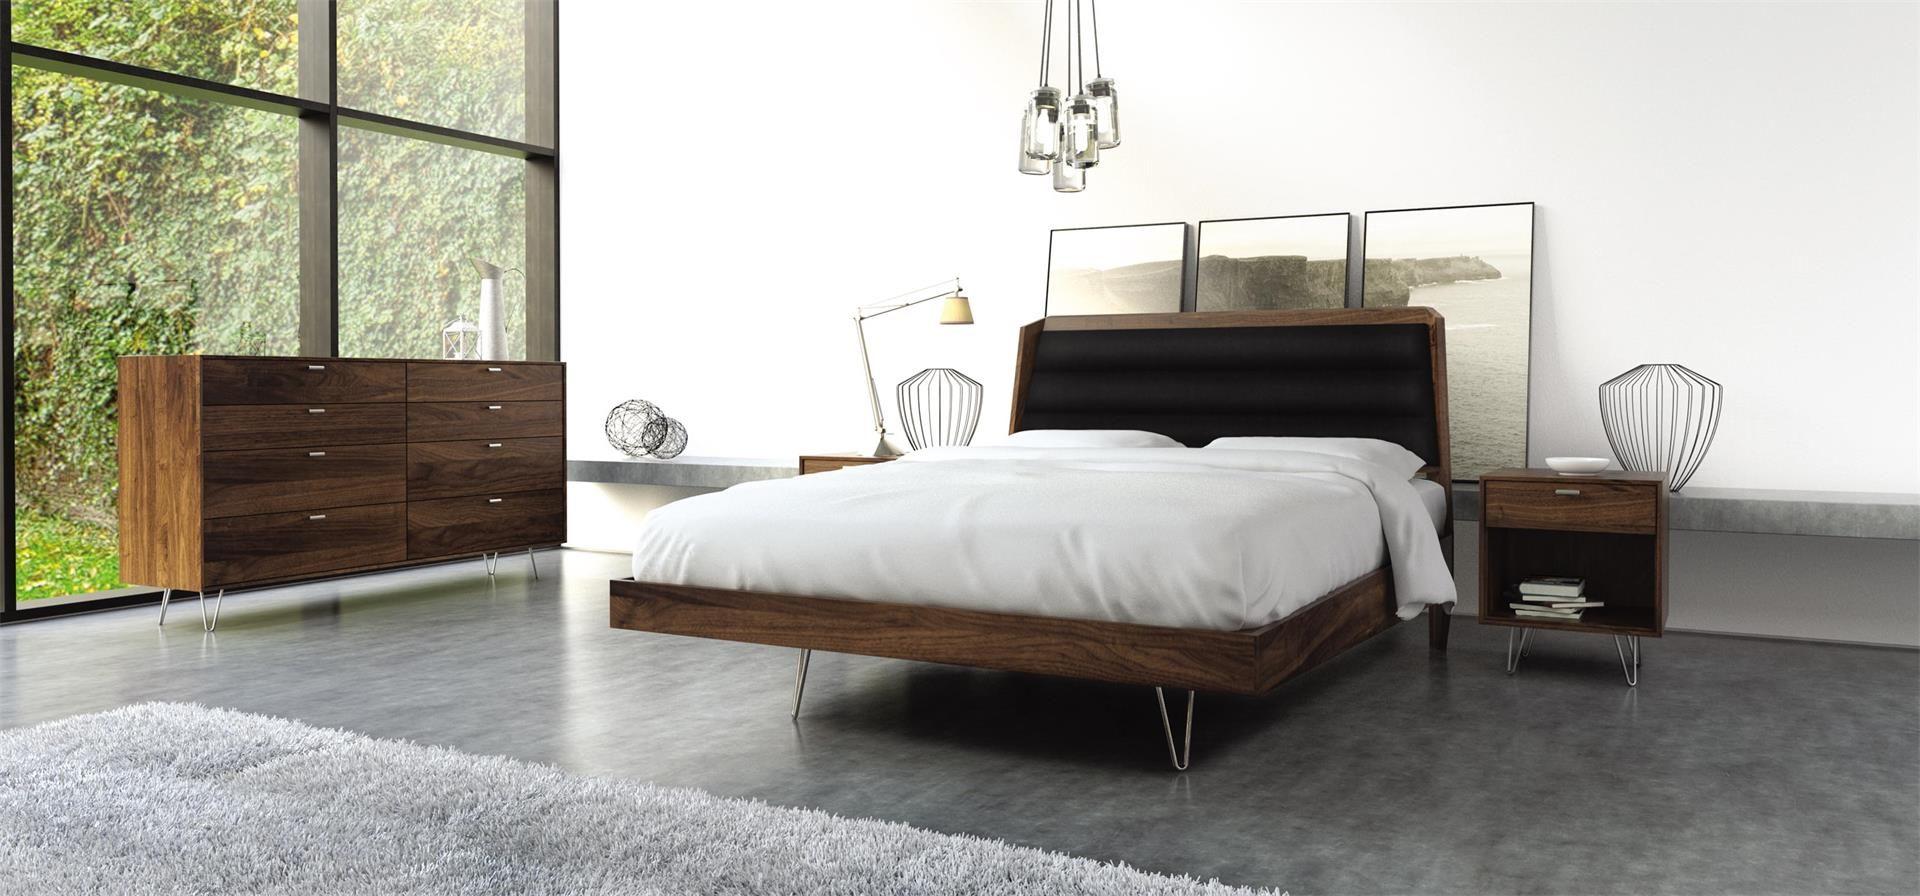 Copeland Canto Bed Bedroom Decor Ideas Hardwood